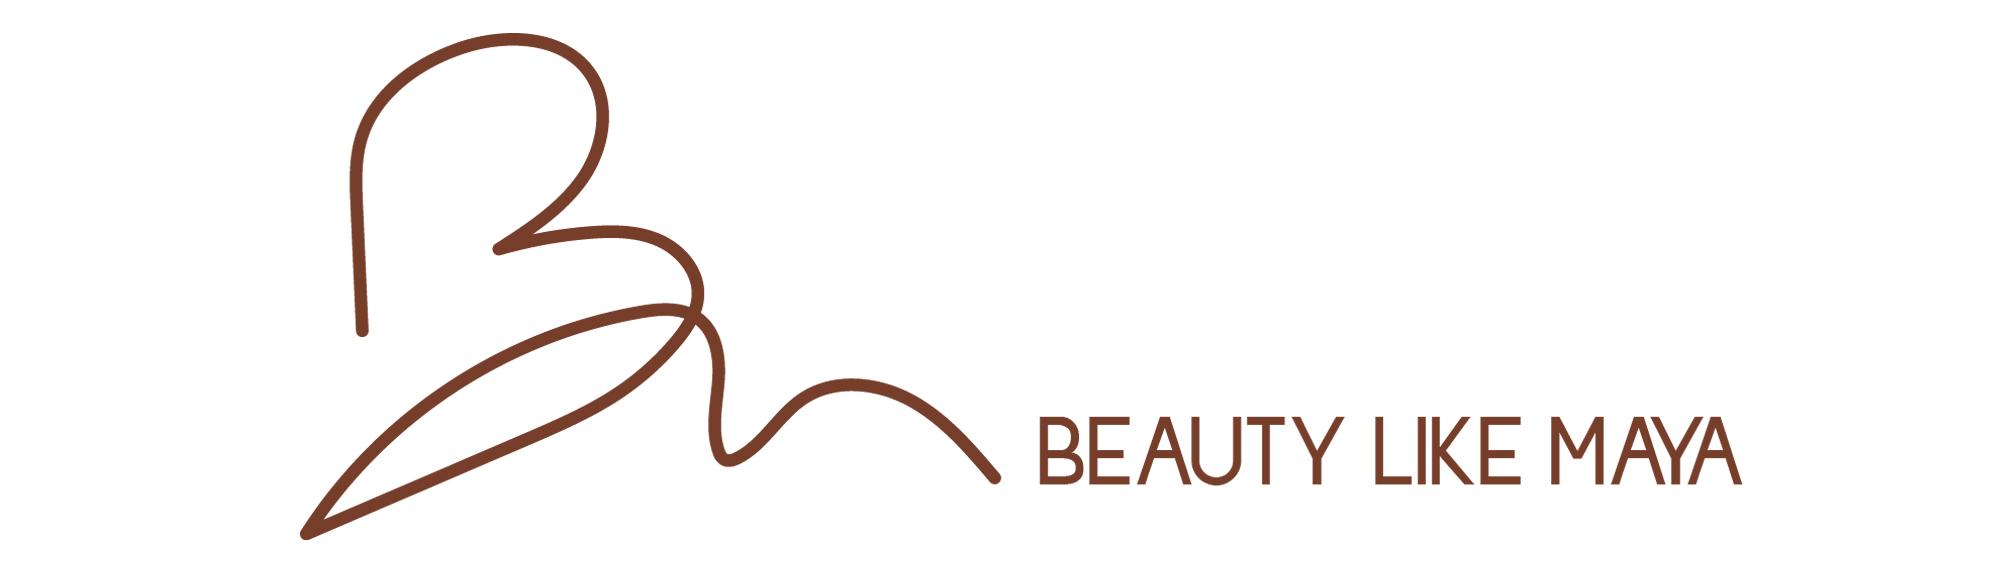 Branding Beauty like Maya 04 - studio katipeifer